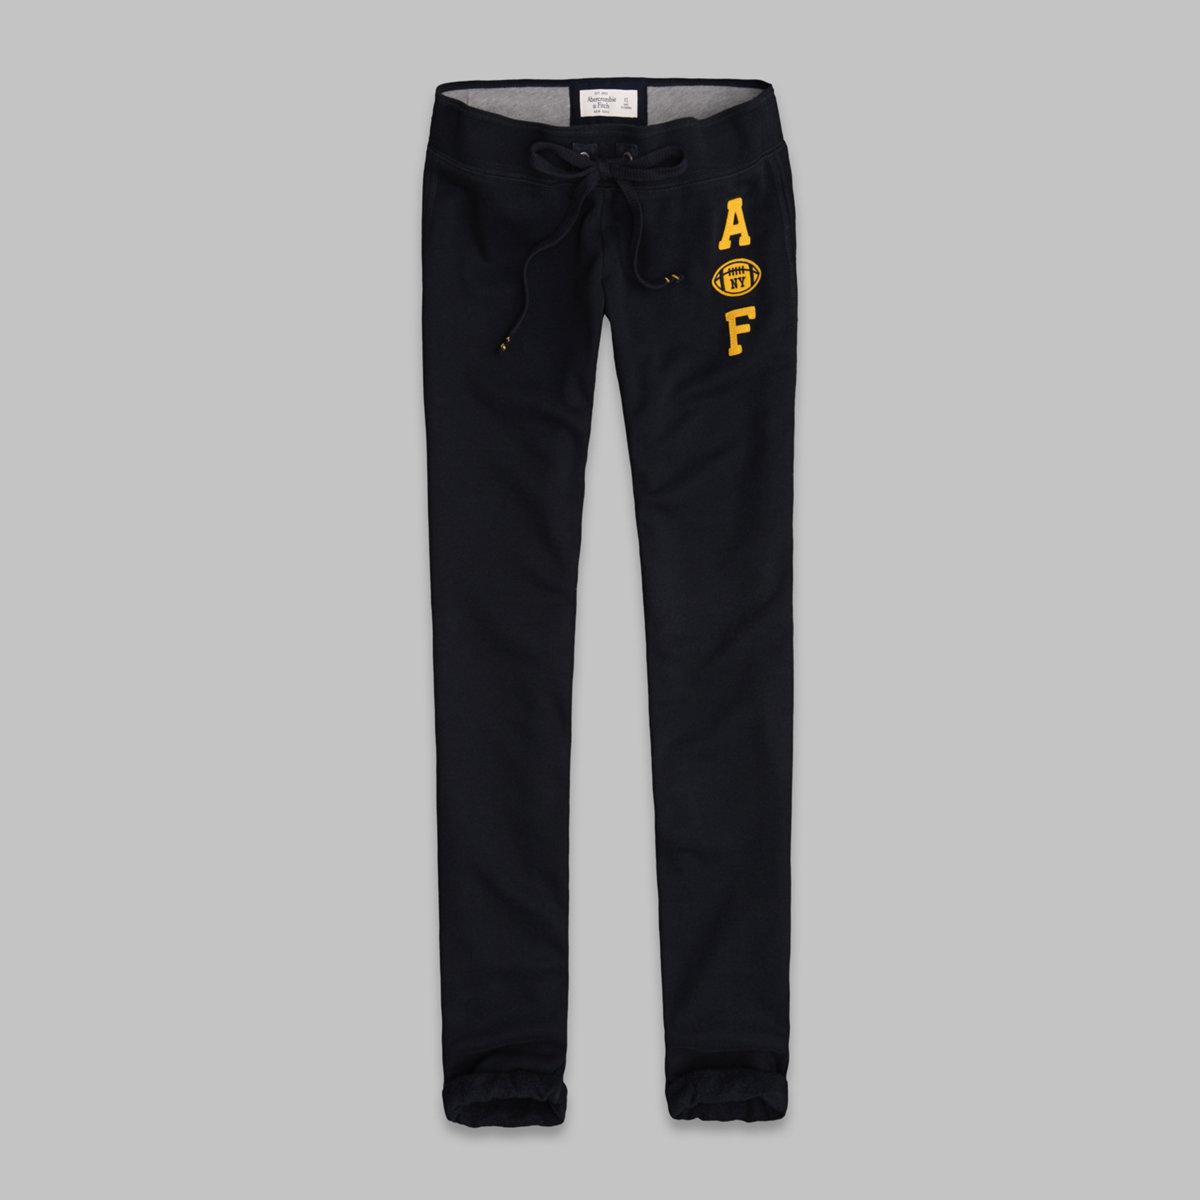 A&F Skinny Banded Sweatpants